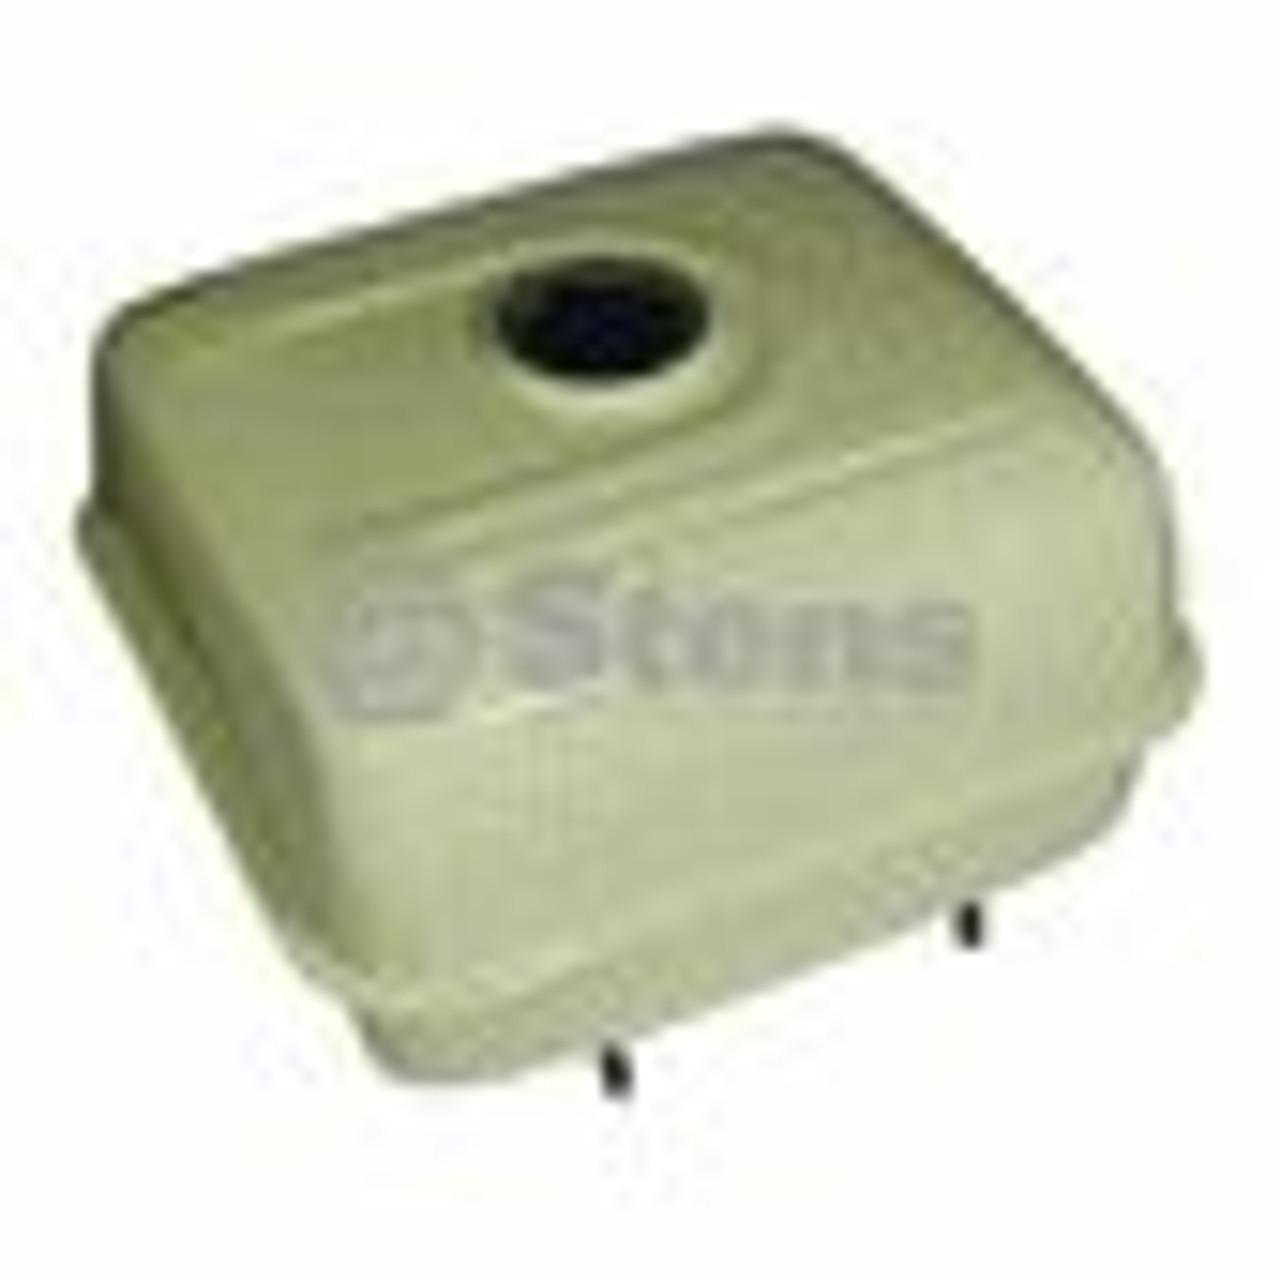 Stens 120-414 Gas Tank Filter Replaces Honda 17672-880-000